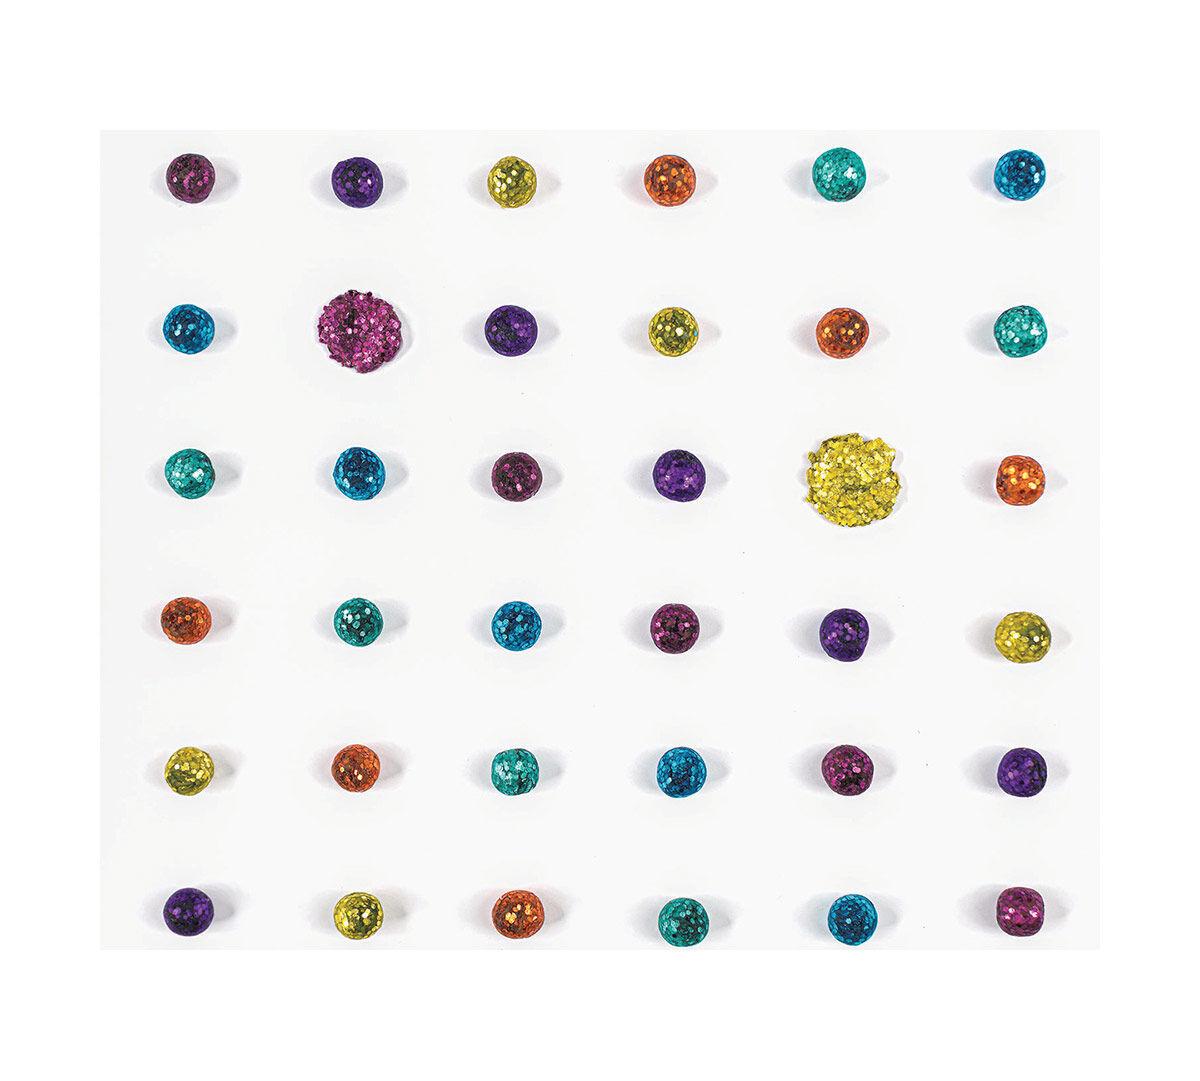 Crayola: Glitter Dots - Stencil Stickers image